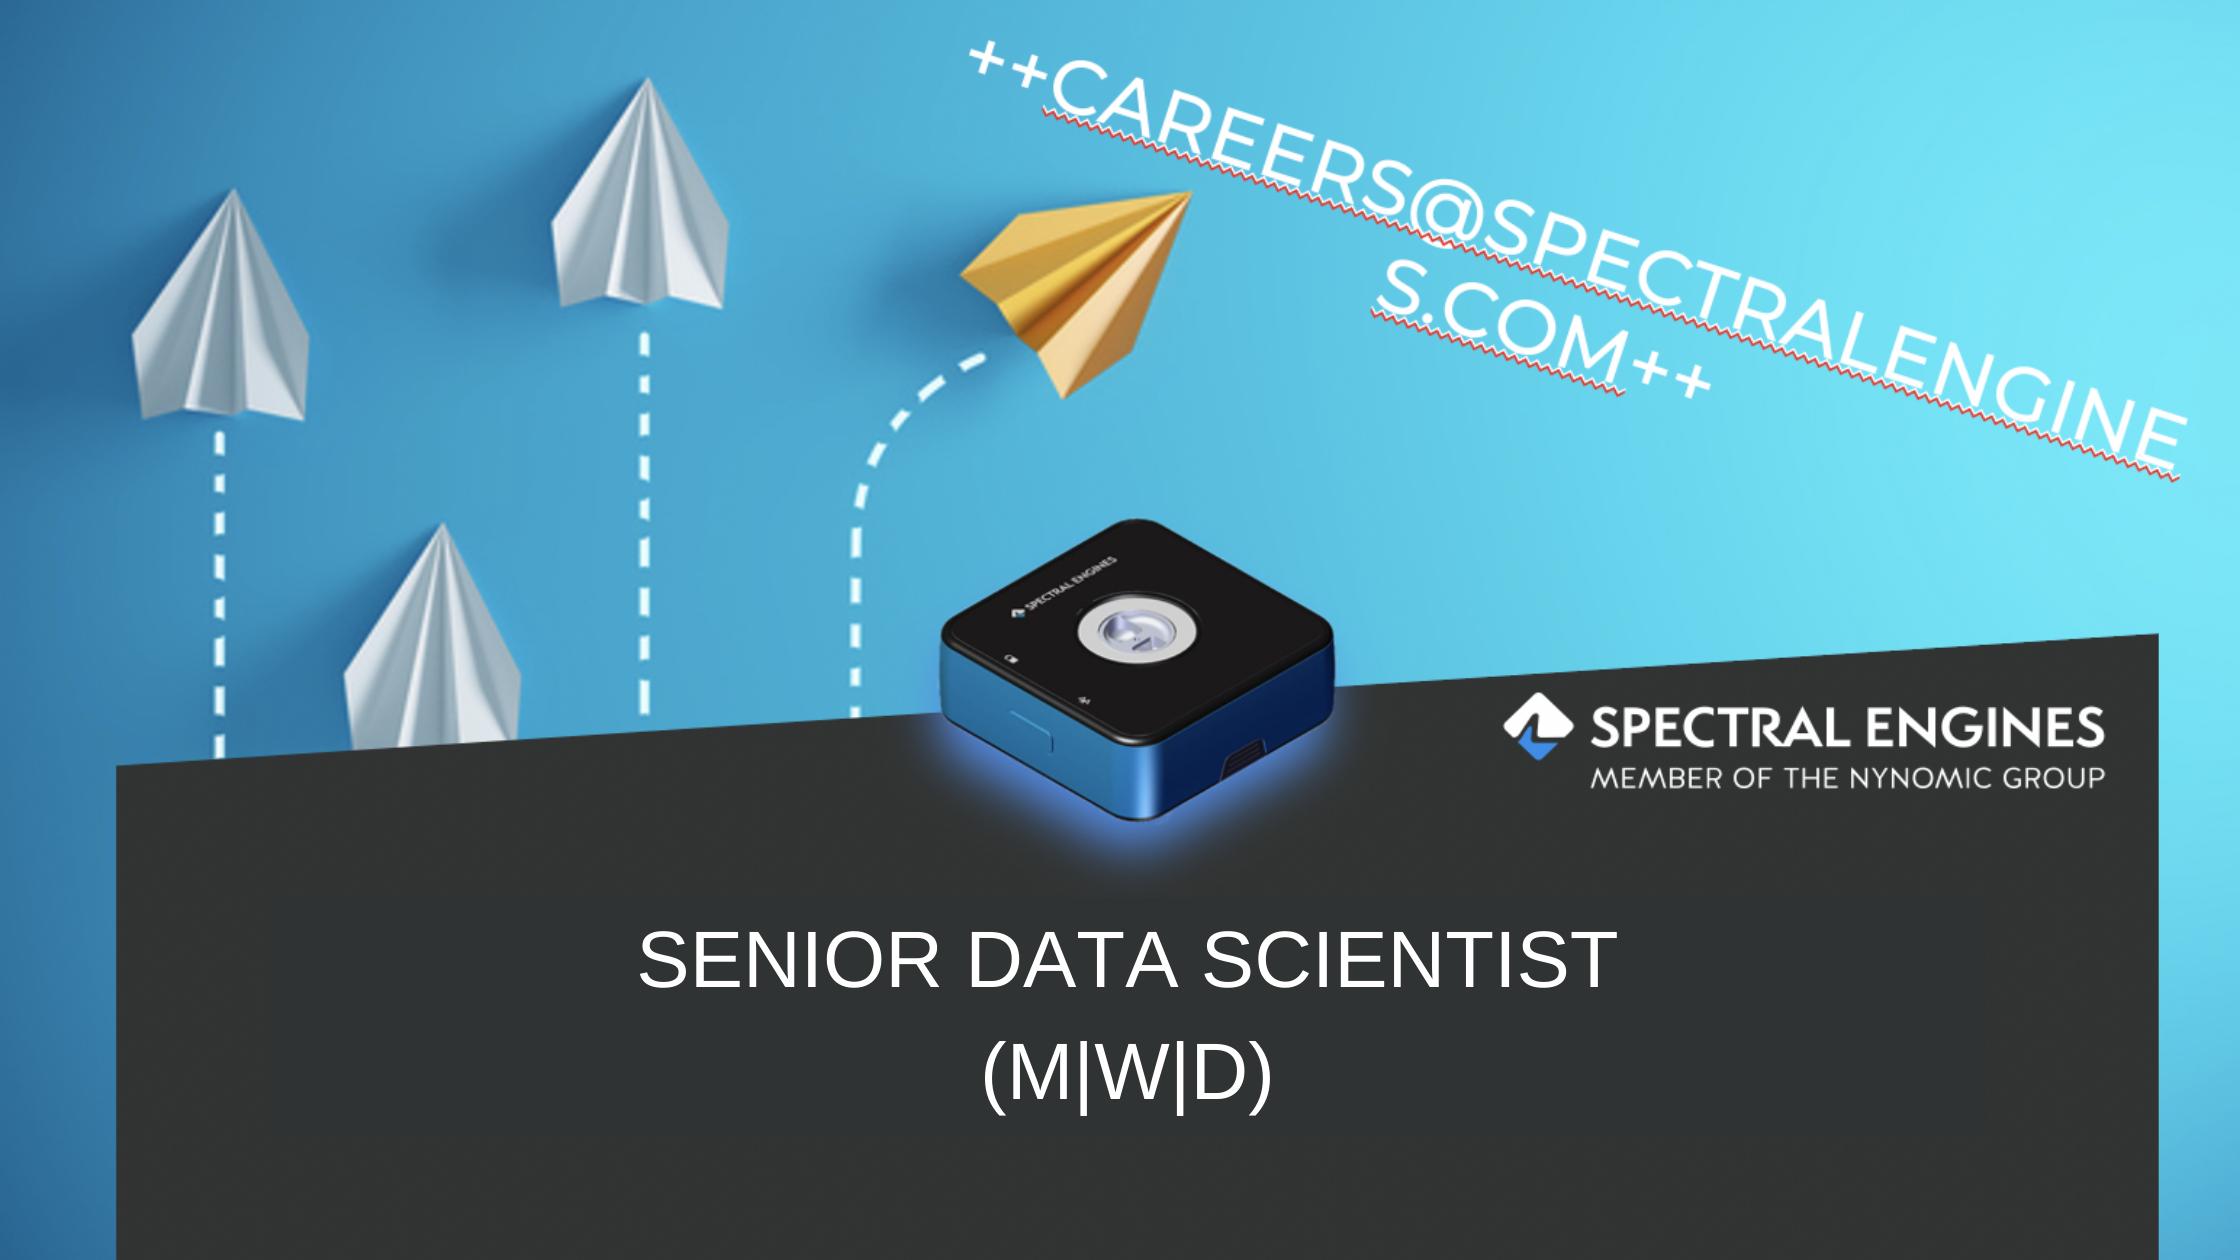 Senior Data Scientist (m|w|d)